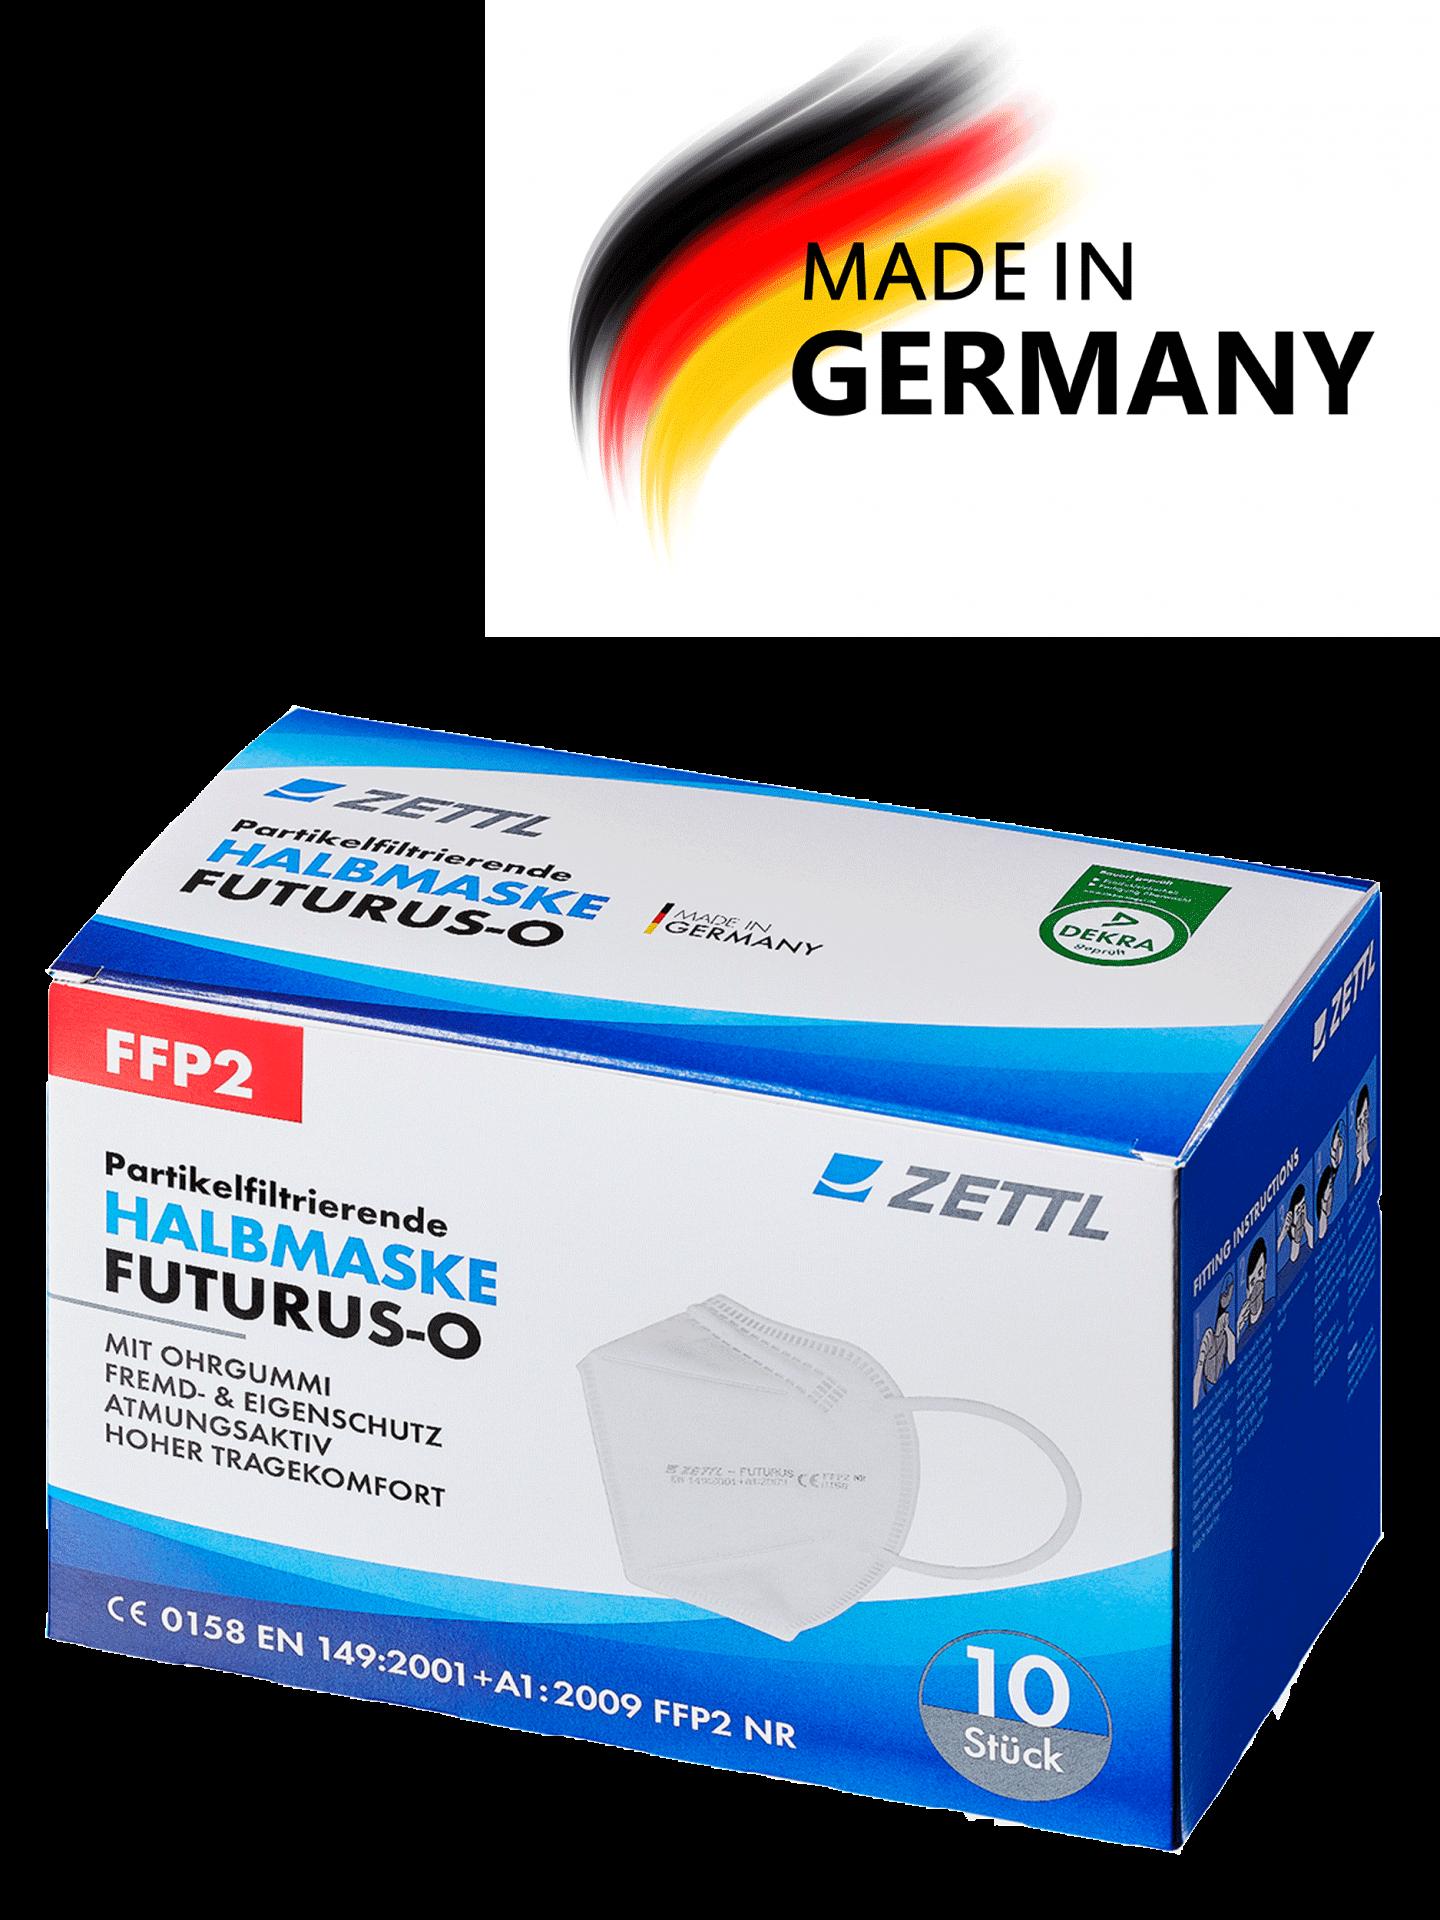 ZETTL FUTURUS-O FFP2 Maske